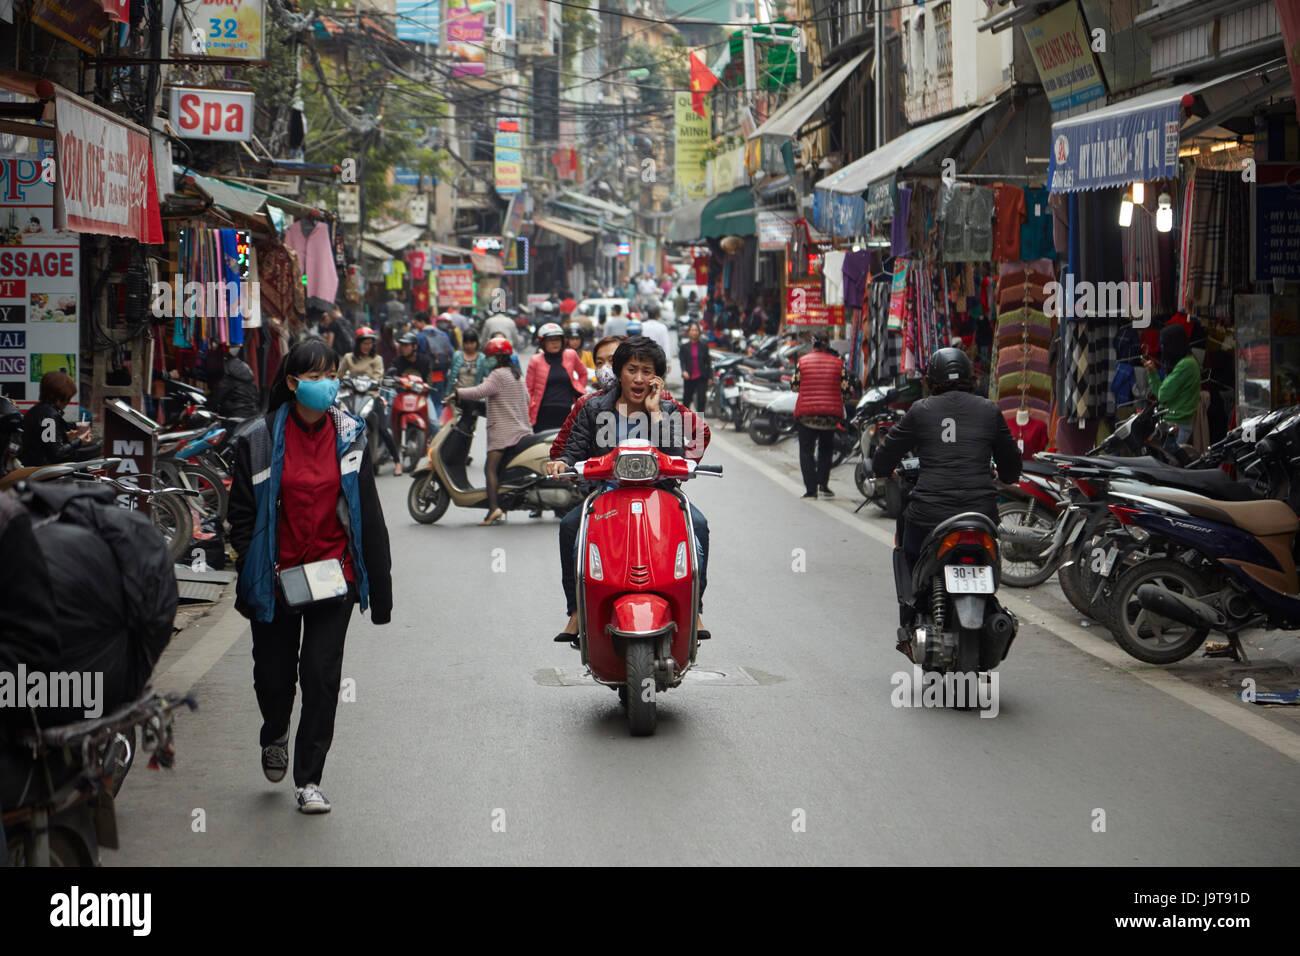 Busy street scene, Old Quarter, Hanoi, Vietnam - Stock Image